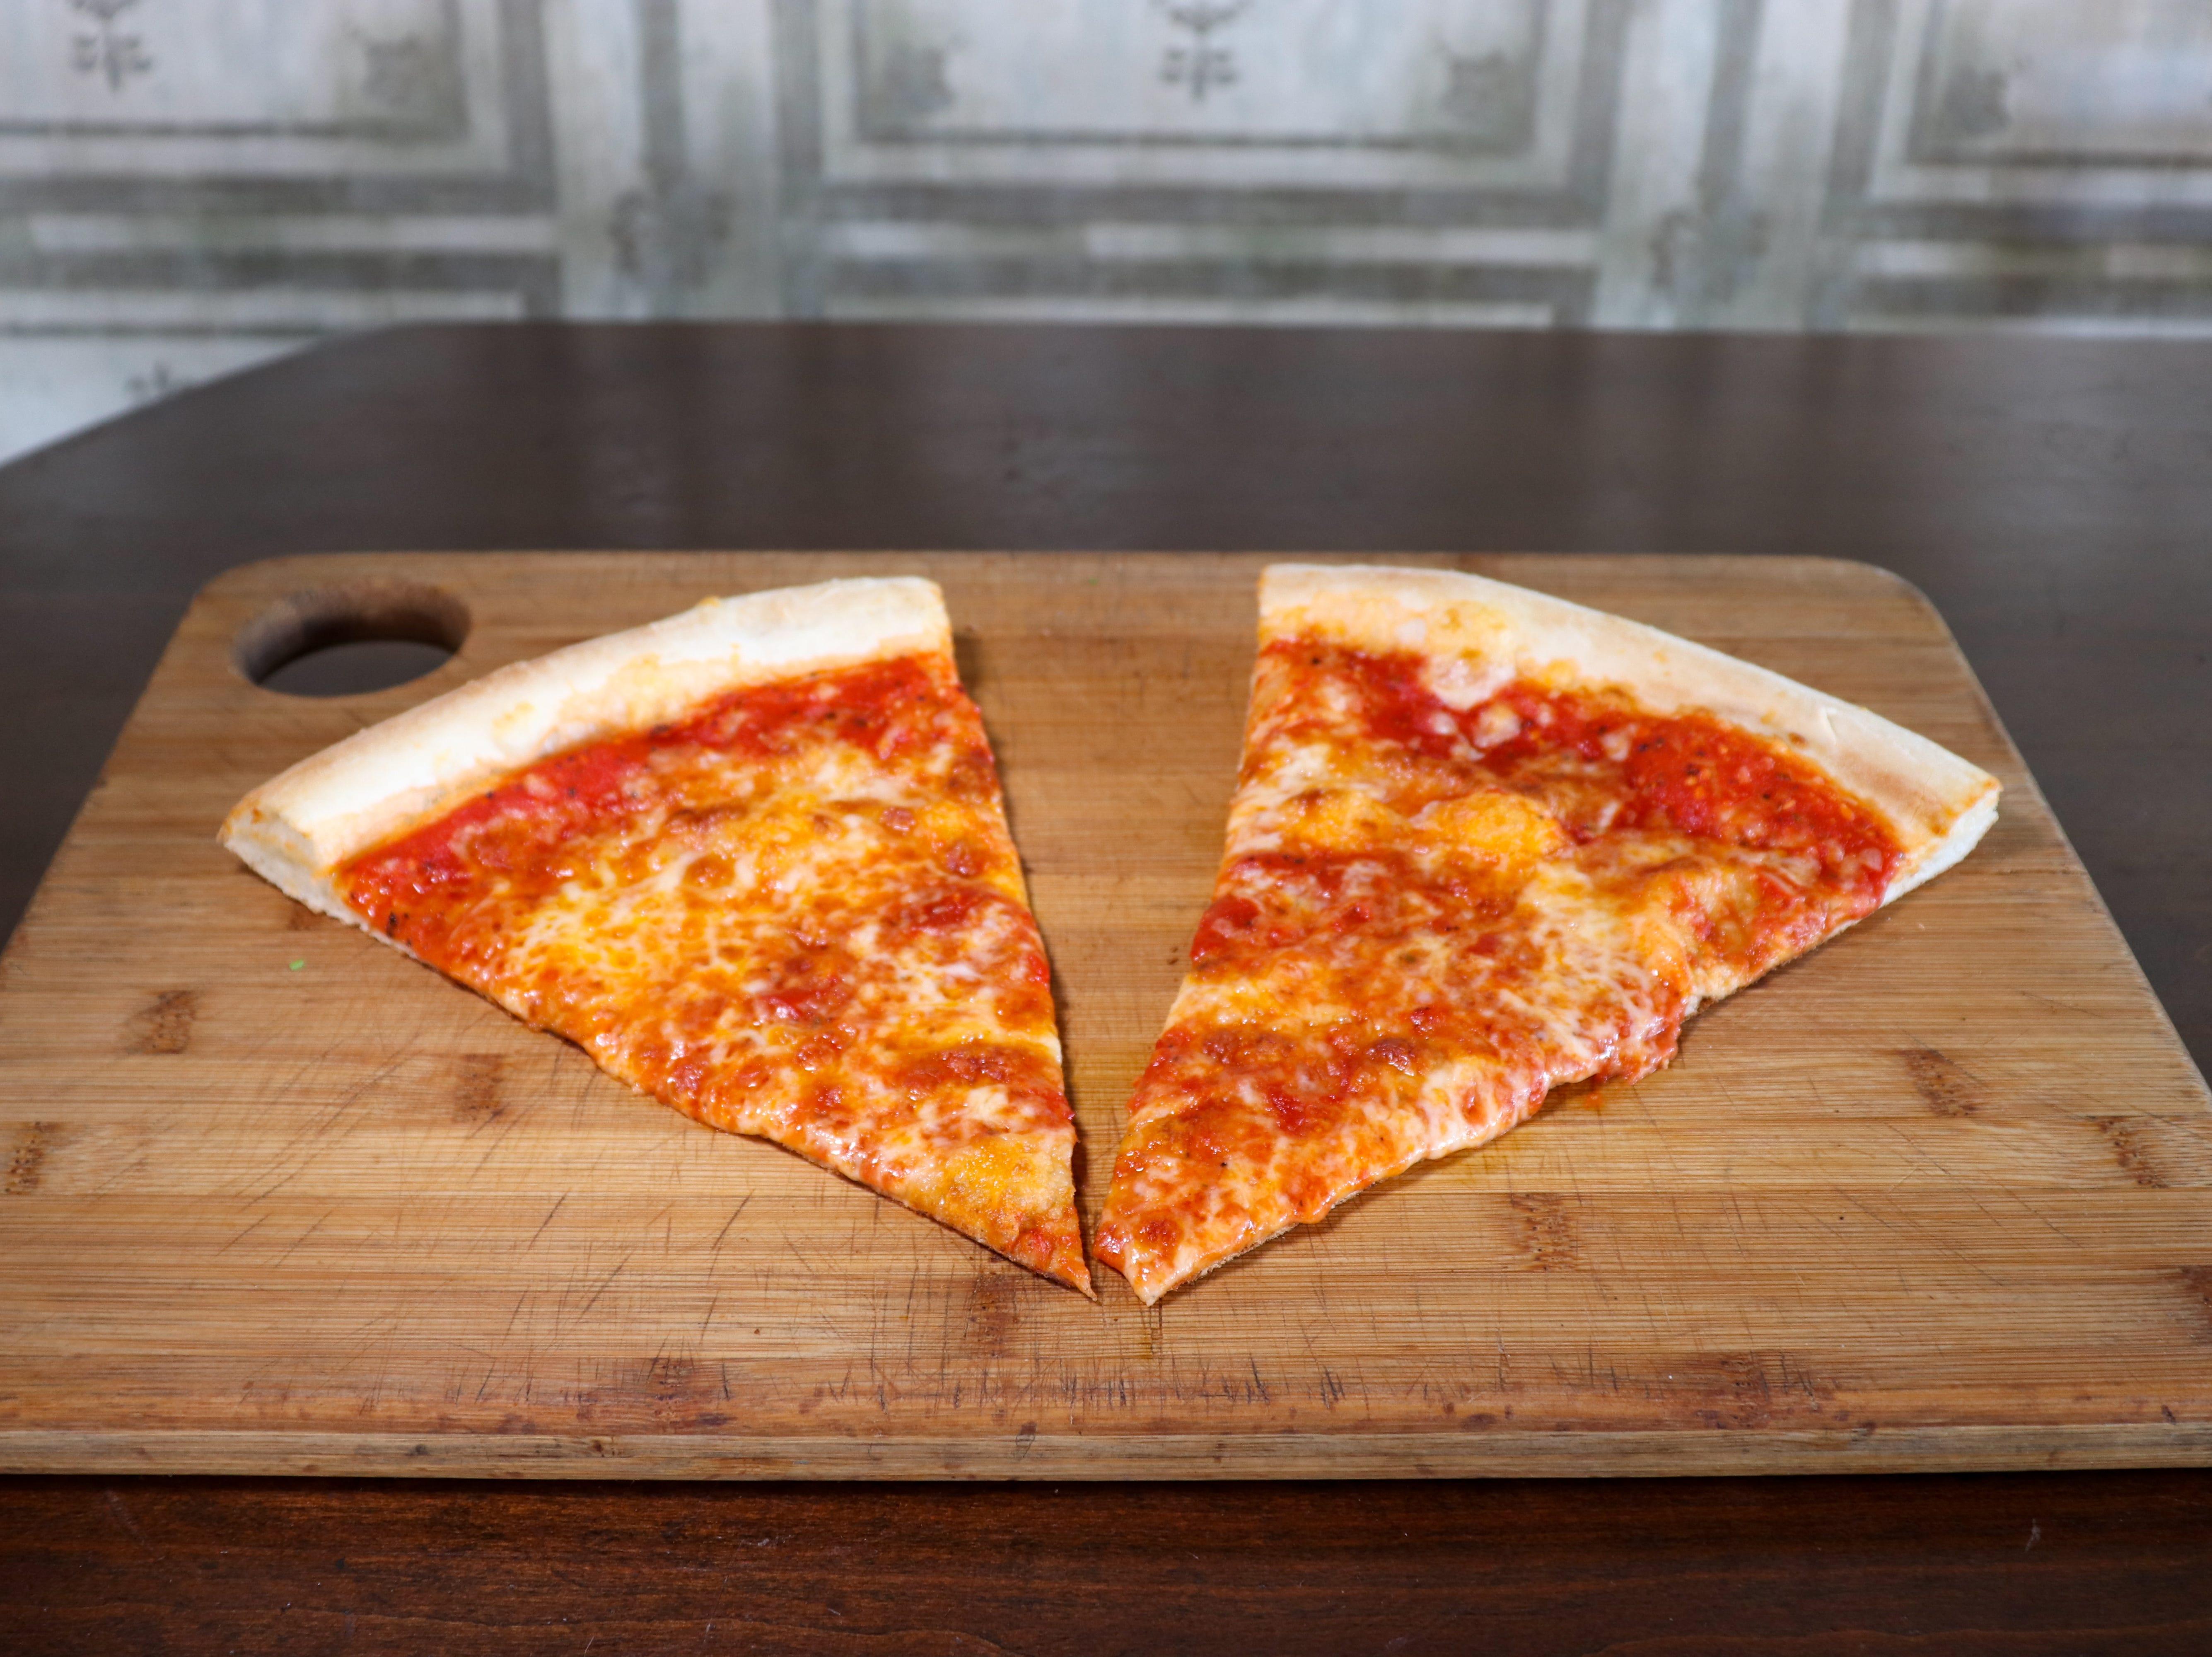 Pizza slices at Crust Pizzeria and Italian Restaurant.